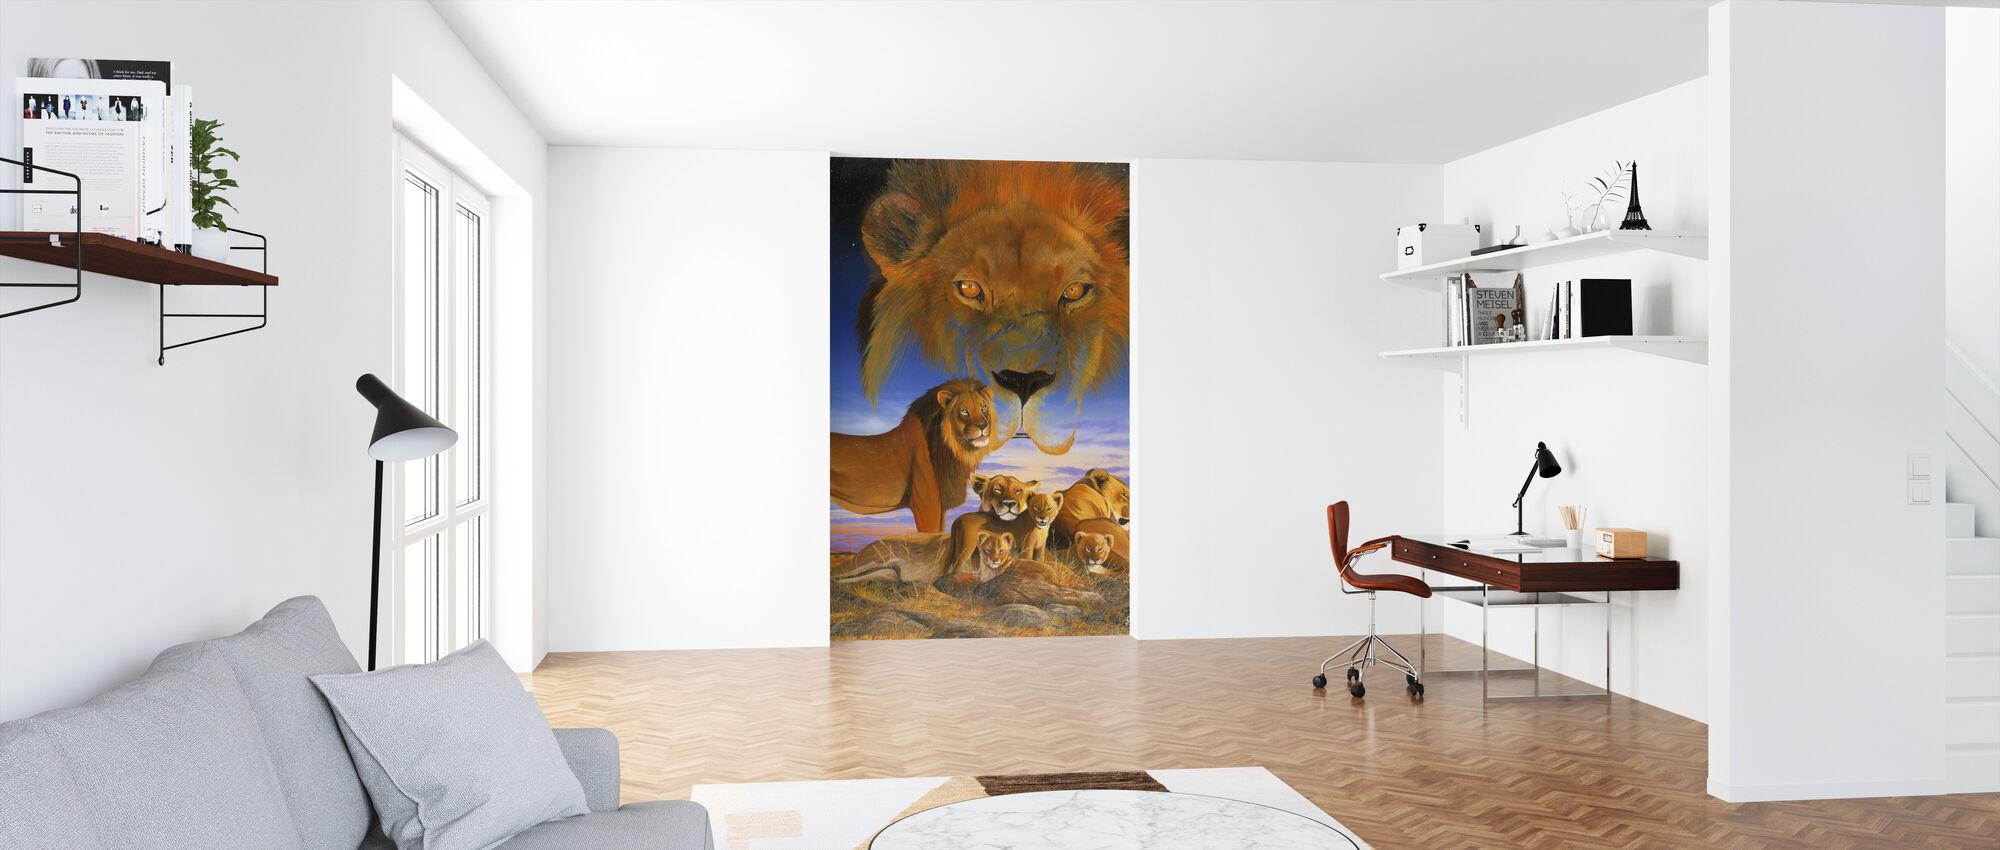 Masai Morning - Wallpaper - Office